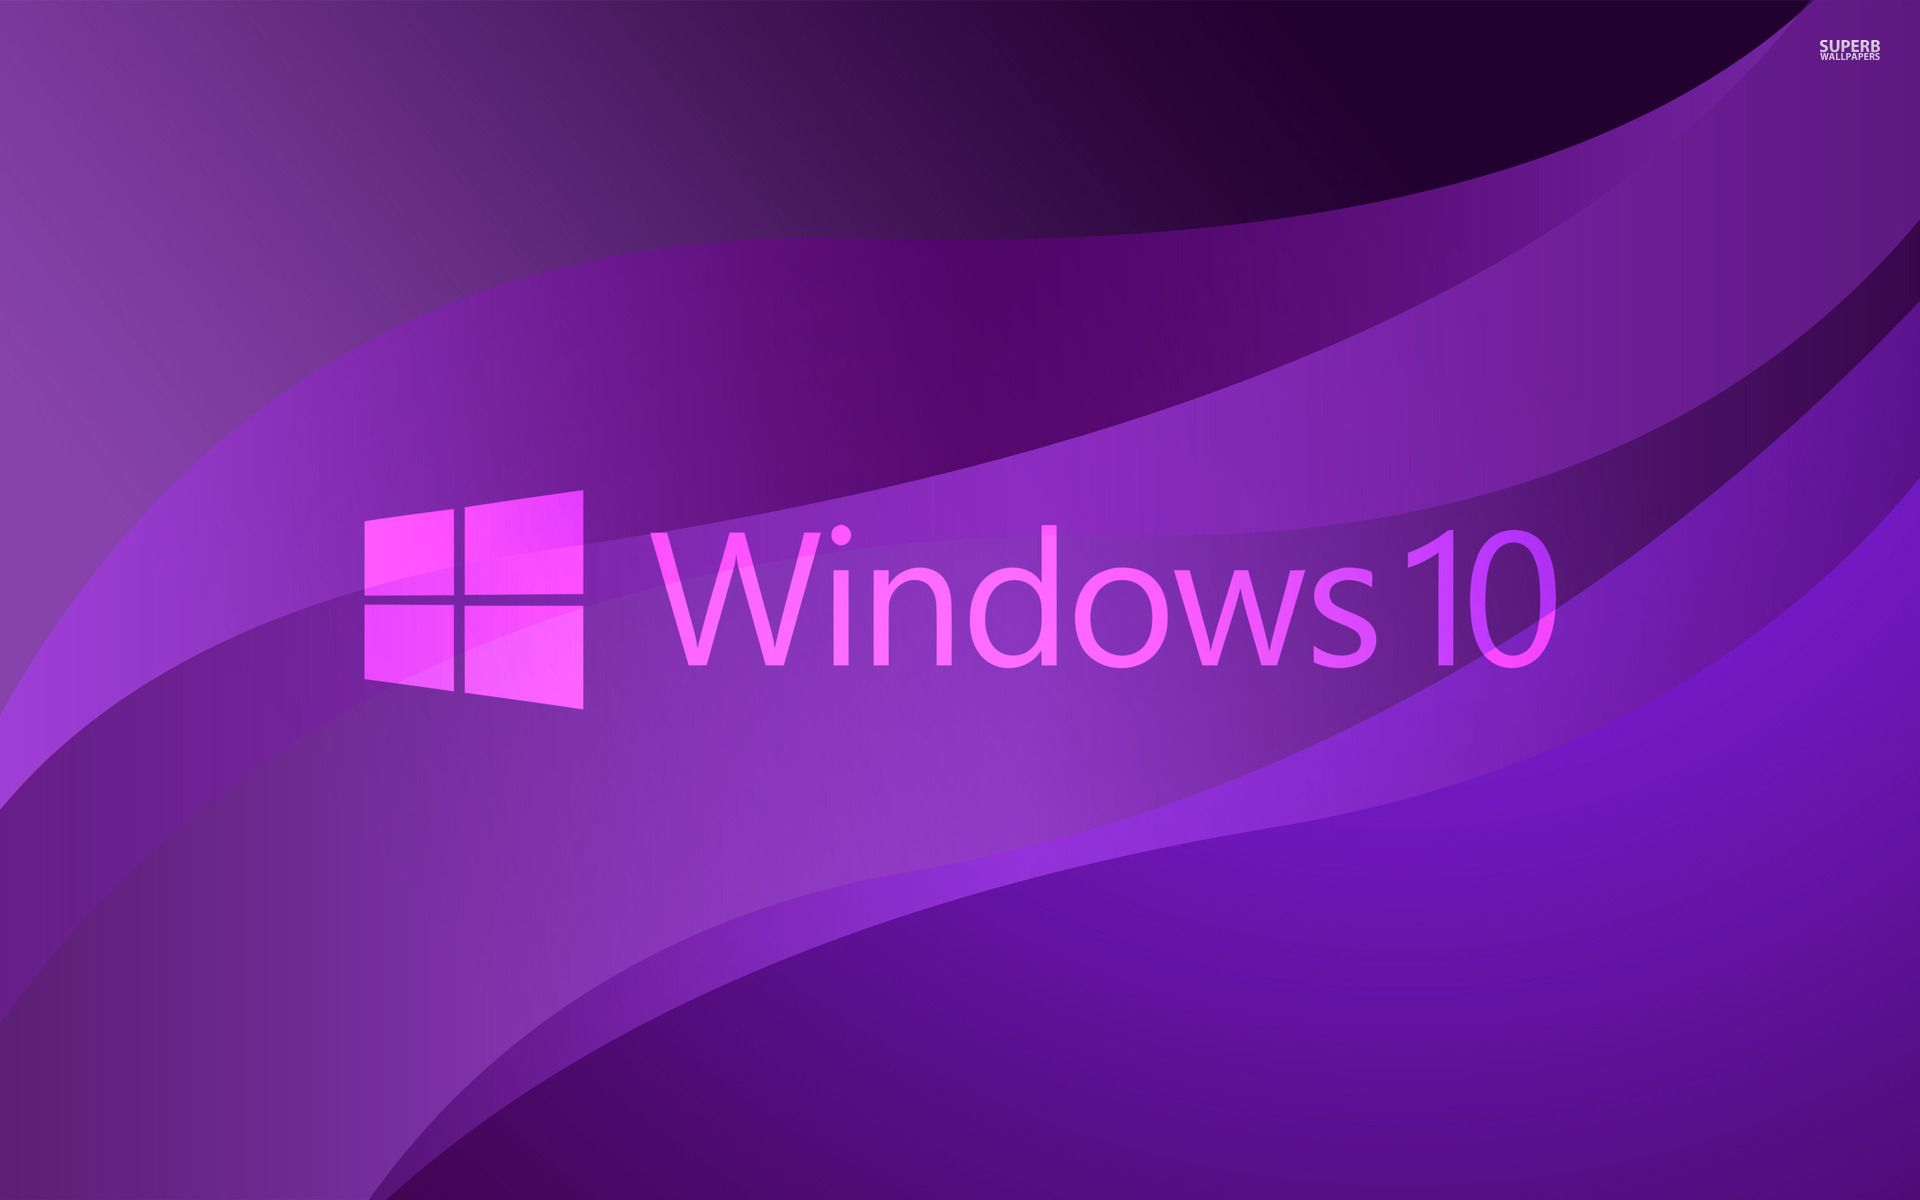 Windows 10 Transparent Text Logo On Purple Wallpaper Purple Wallpaper Transparent Text Windows